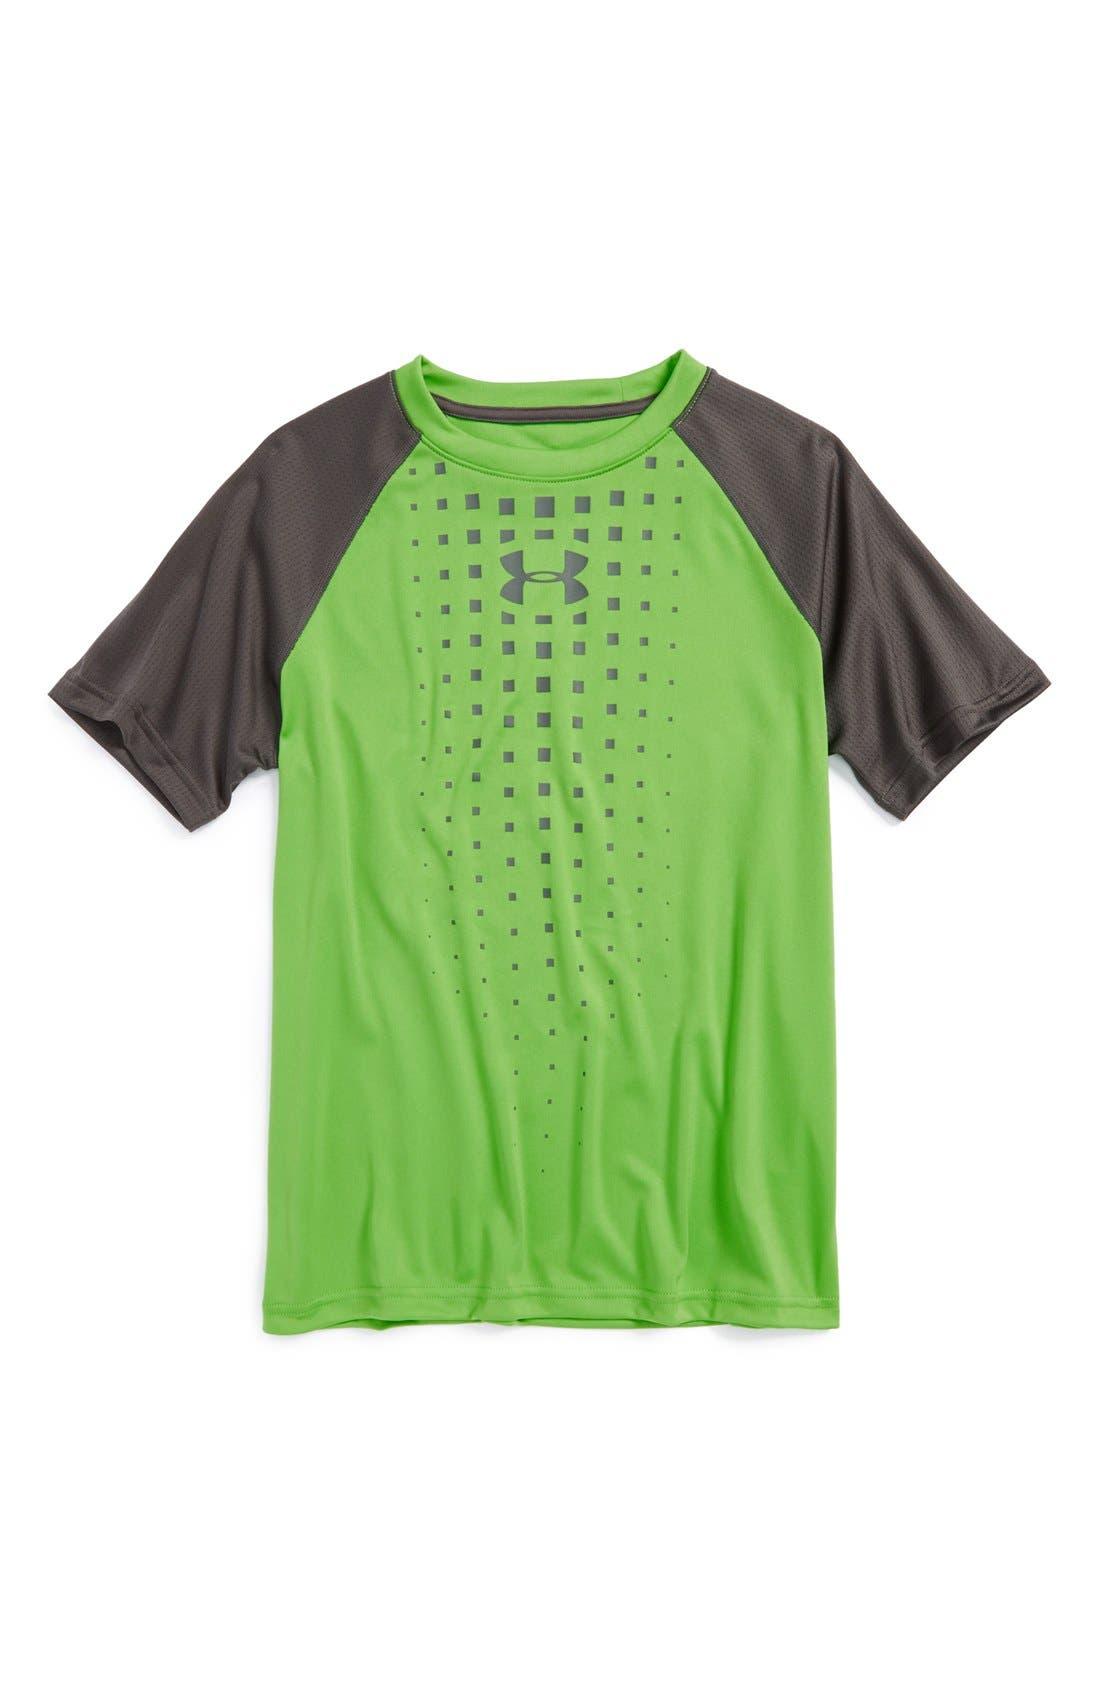 Main Image - Under Armour 'Awesomeness' HeatGear® Short Sleeve T-Shirt (Little Boys)